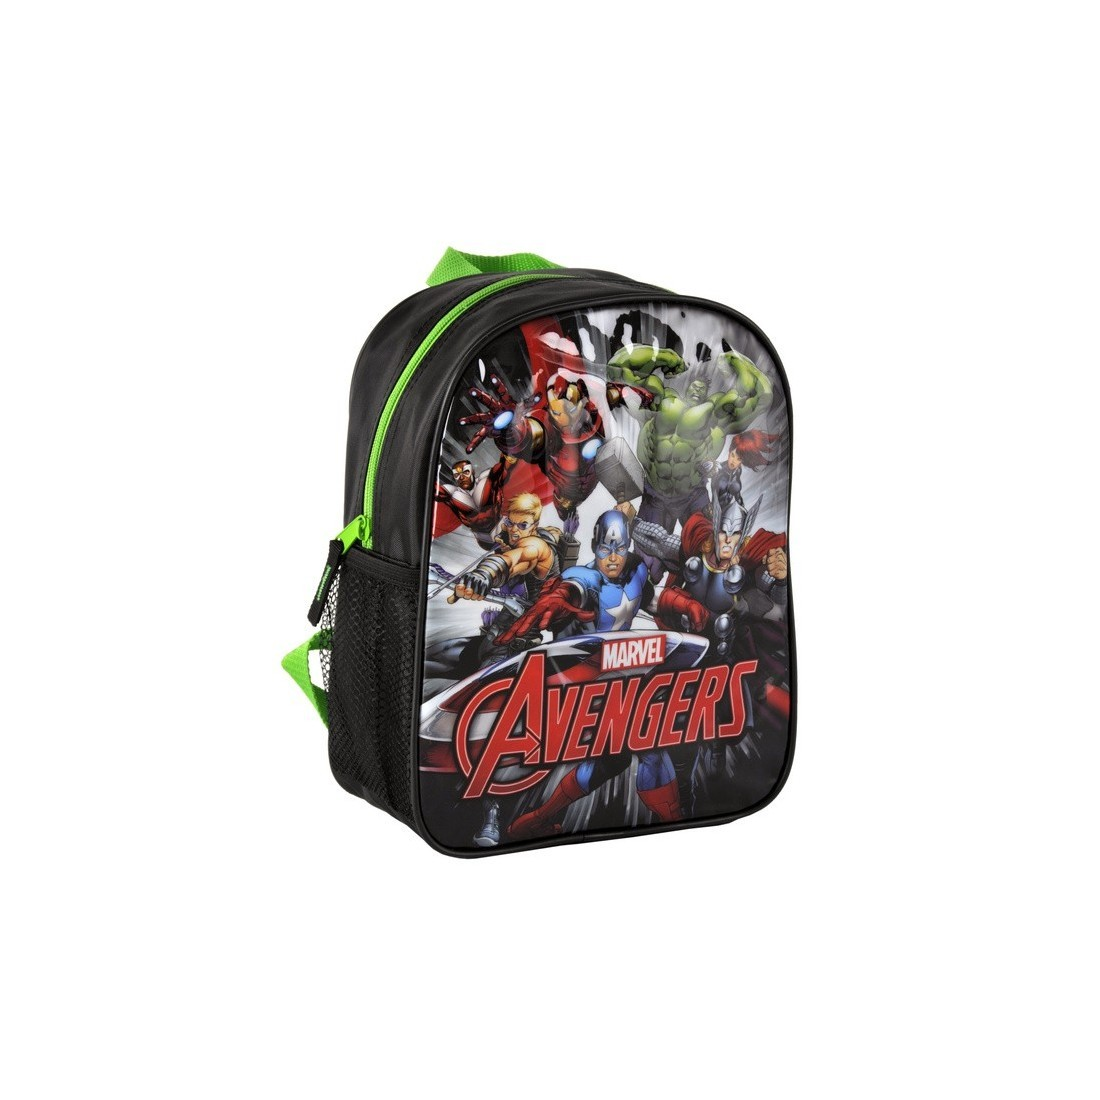 Plecaczek Avengers - plecak-tornister.pl